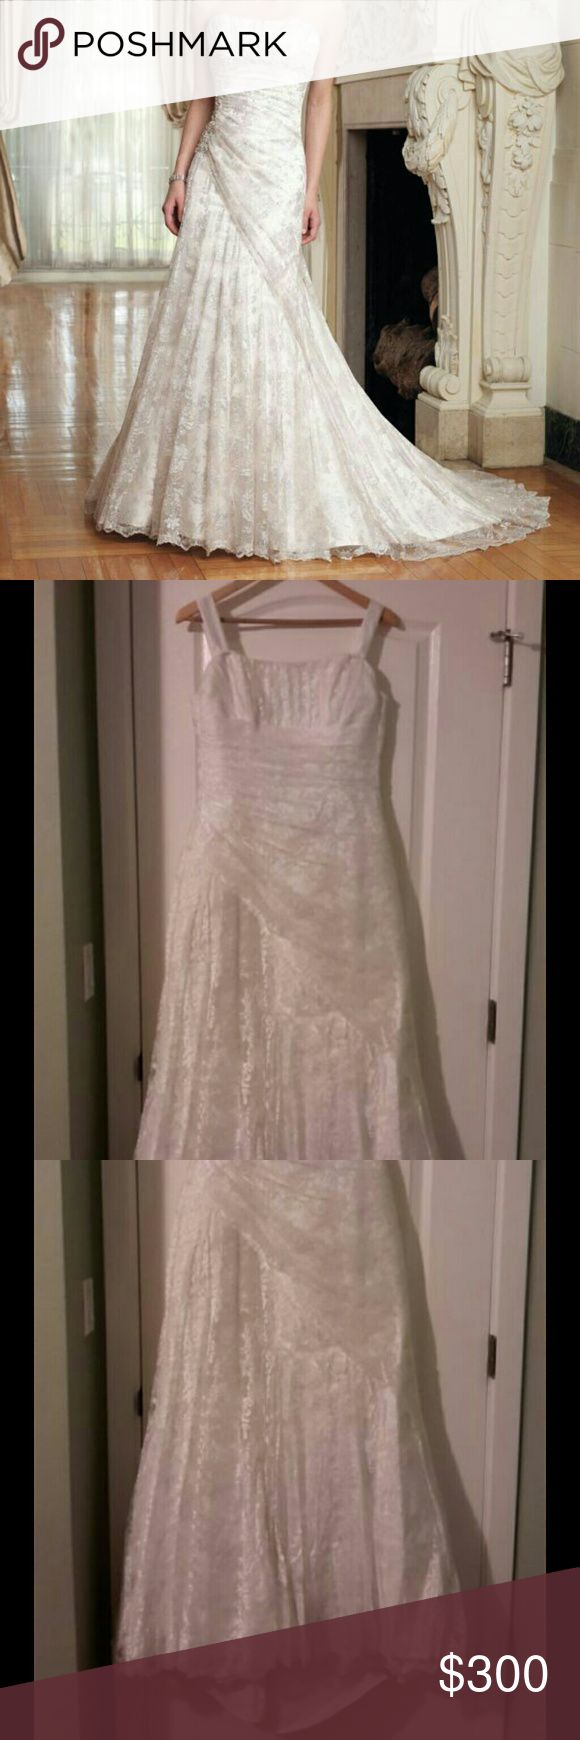 garment bag wedding dress » Wedding Dresses Designs, Ideas and ...